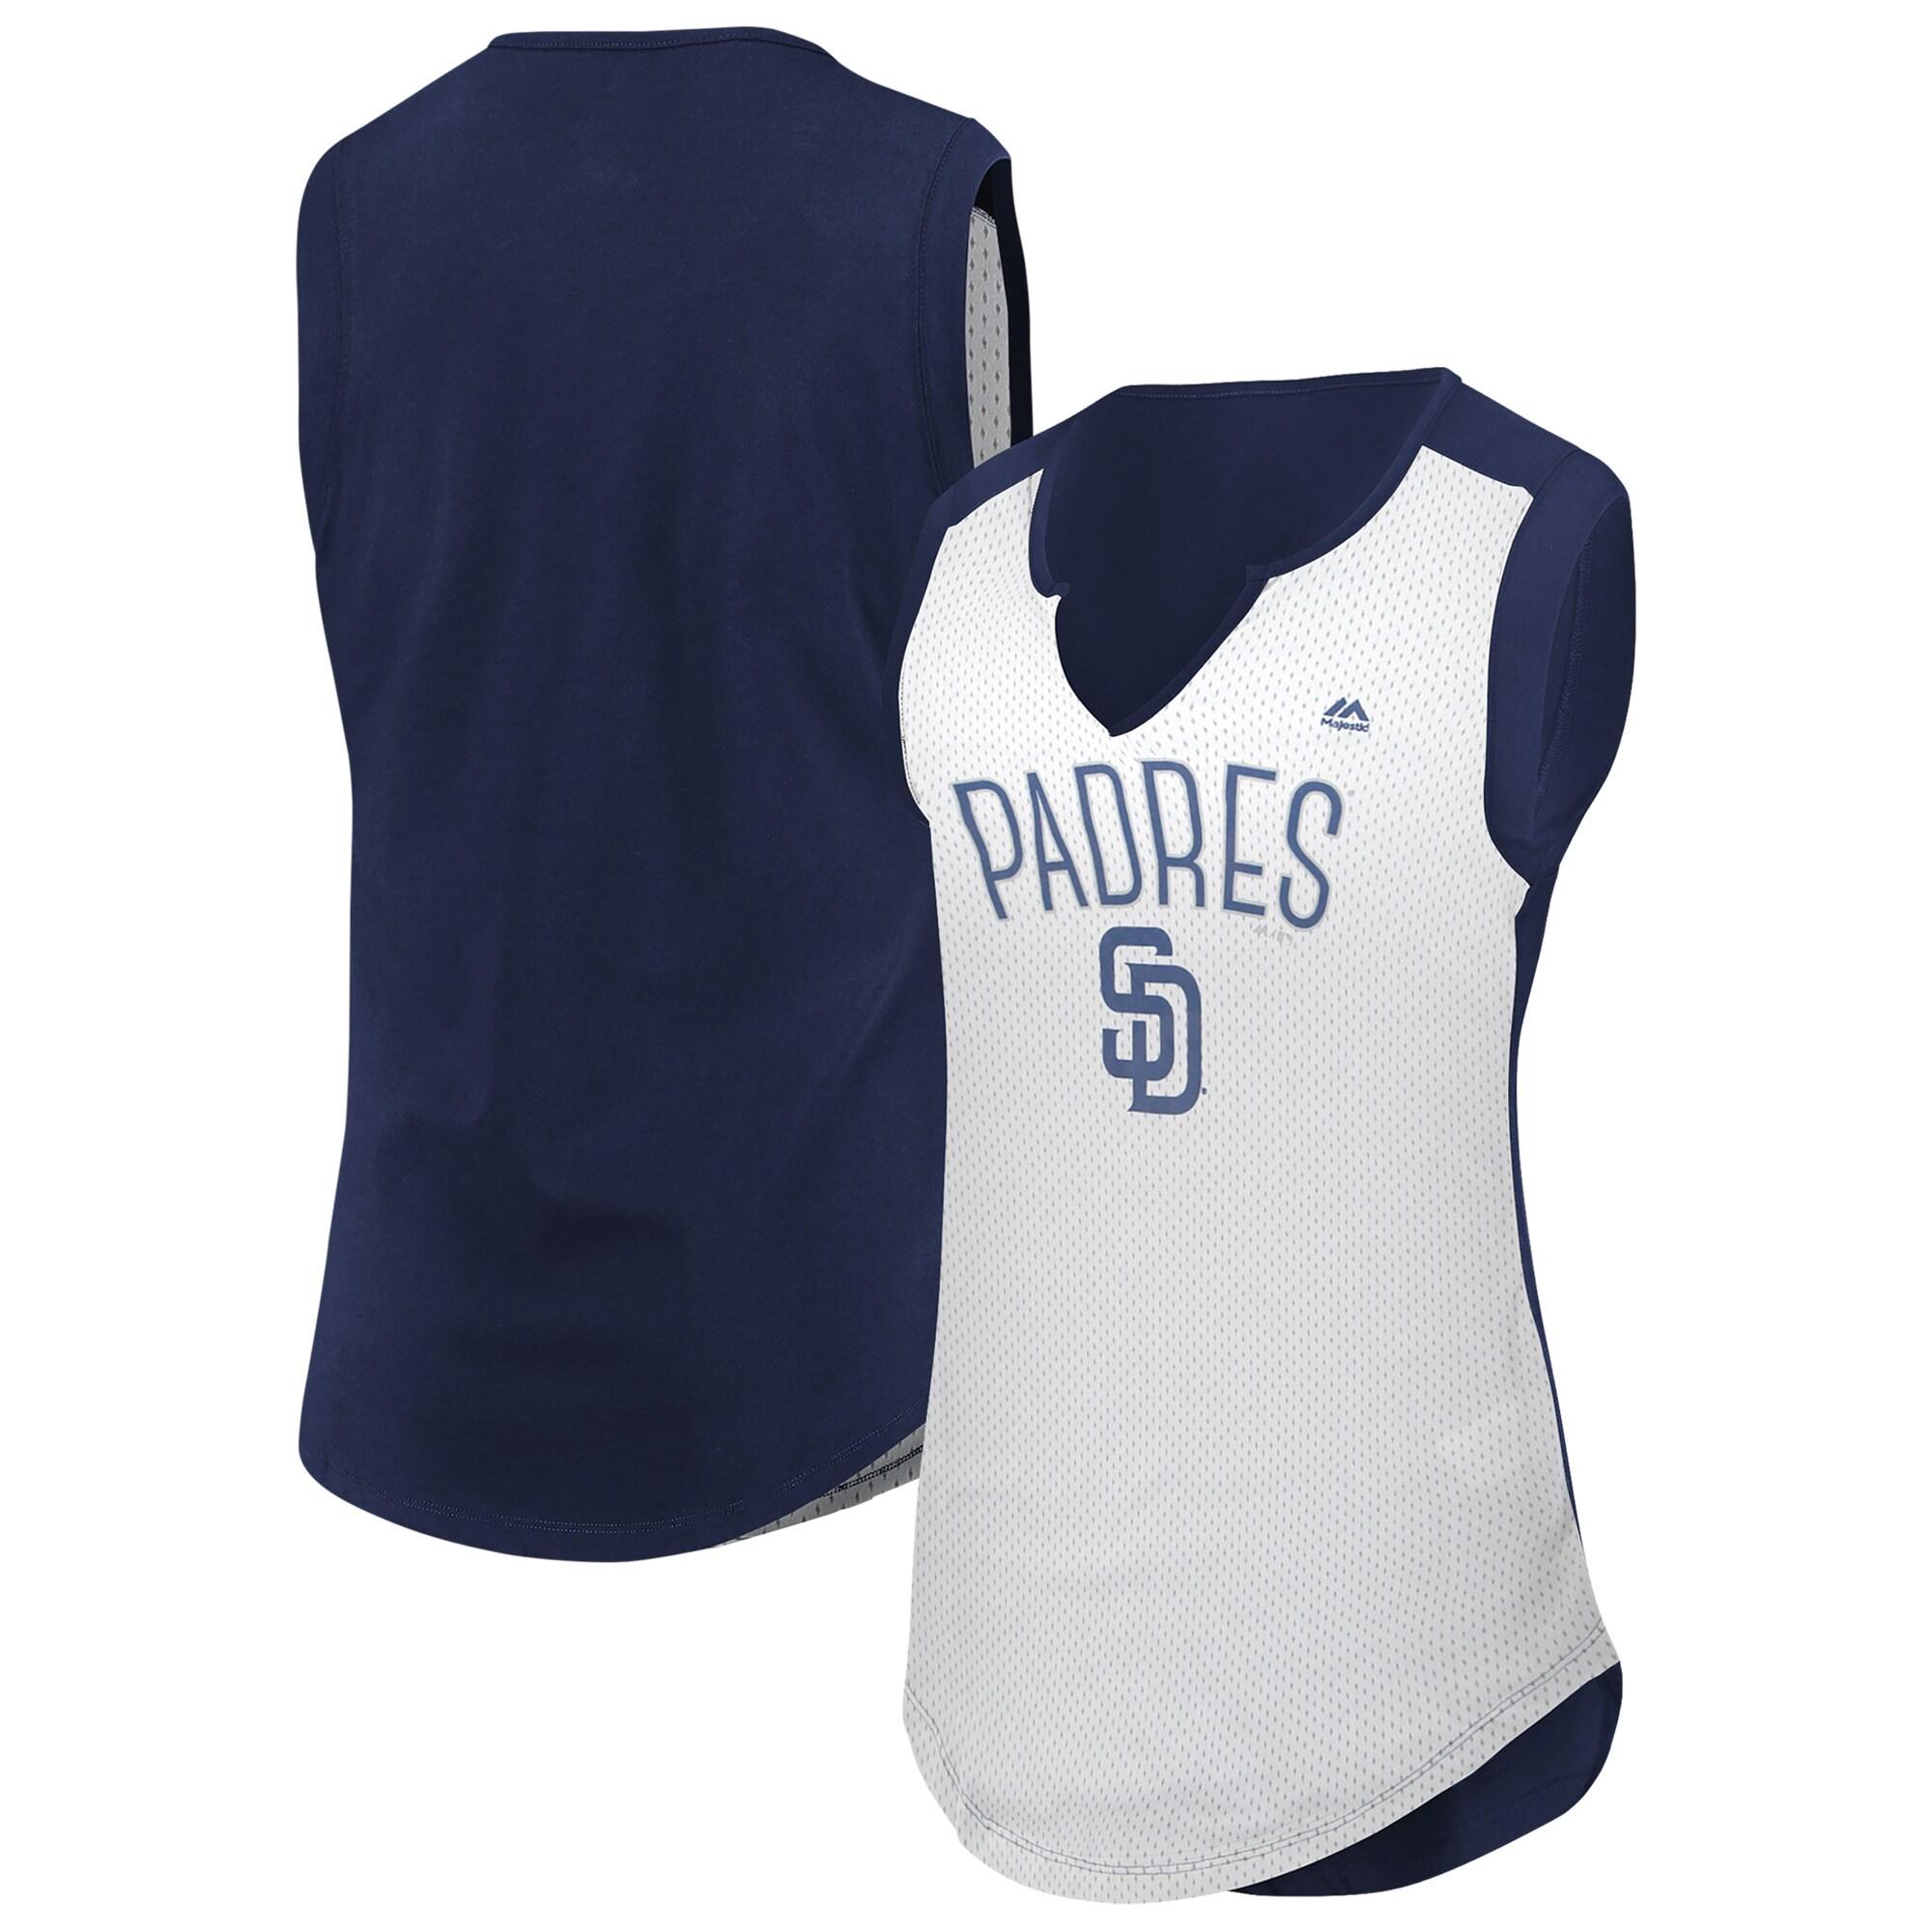 San Diego Padres Majestic Women's Decisive Battle Muscle T-Shirt - White